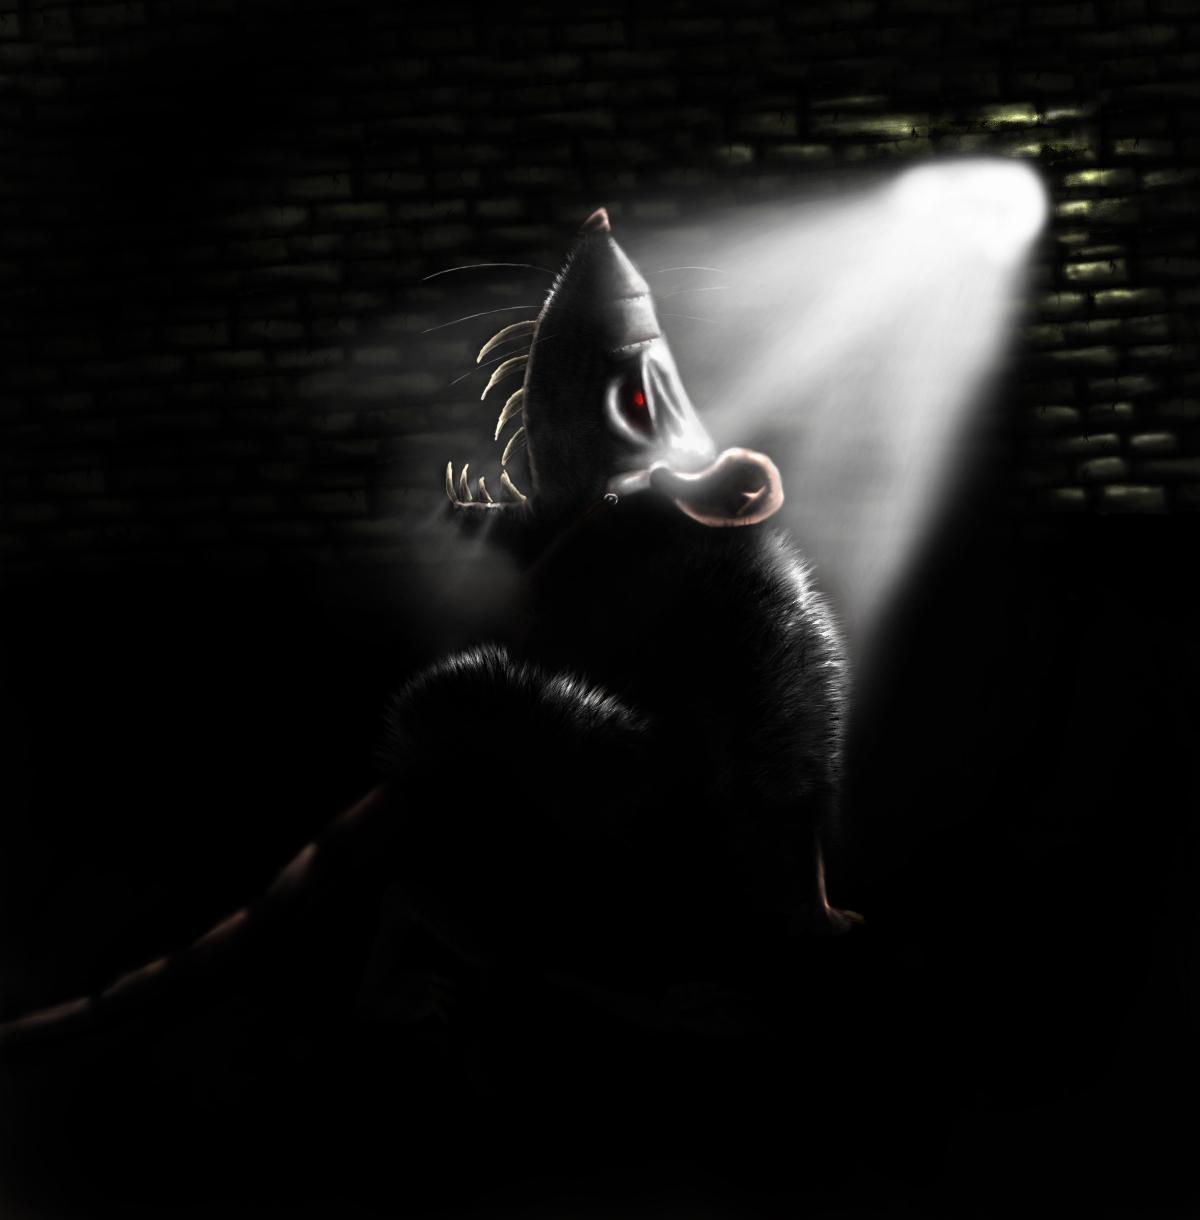 https://fc08.deviantart.com/fs29/f/2008/075/4/2/Black_rat_by_DiBBiEZ.jpg